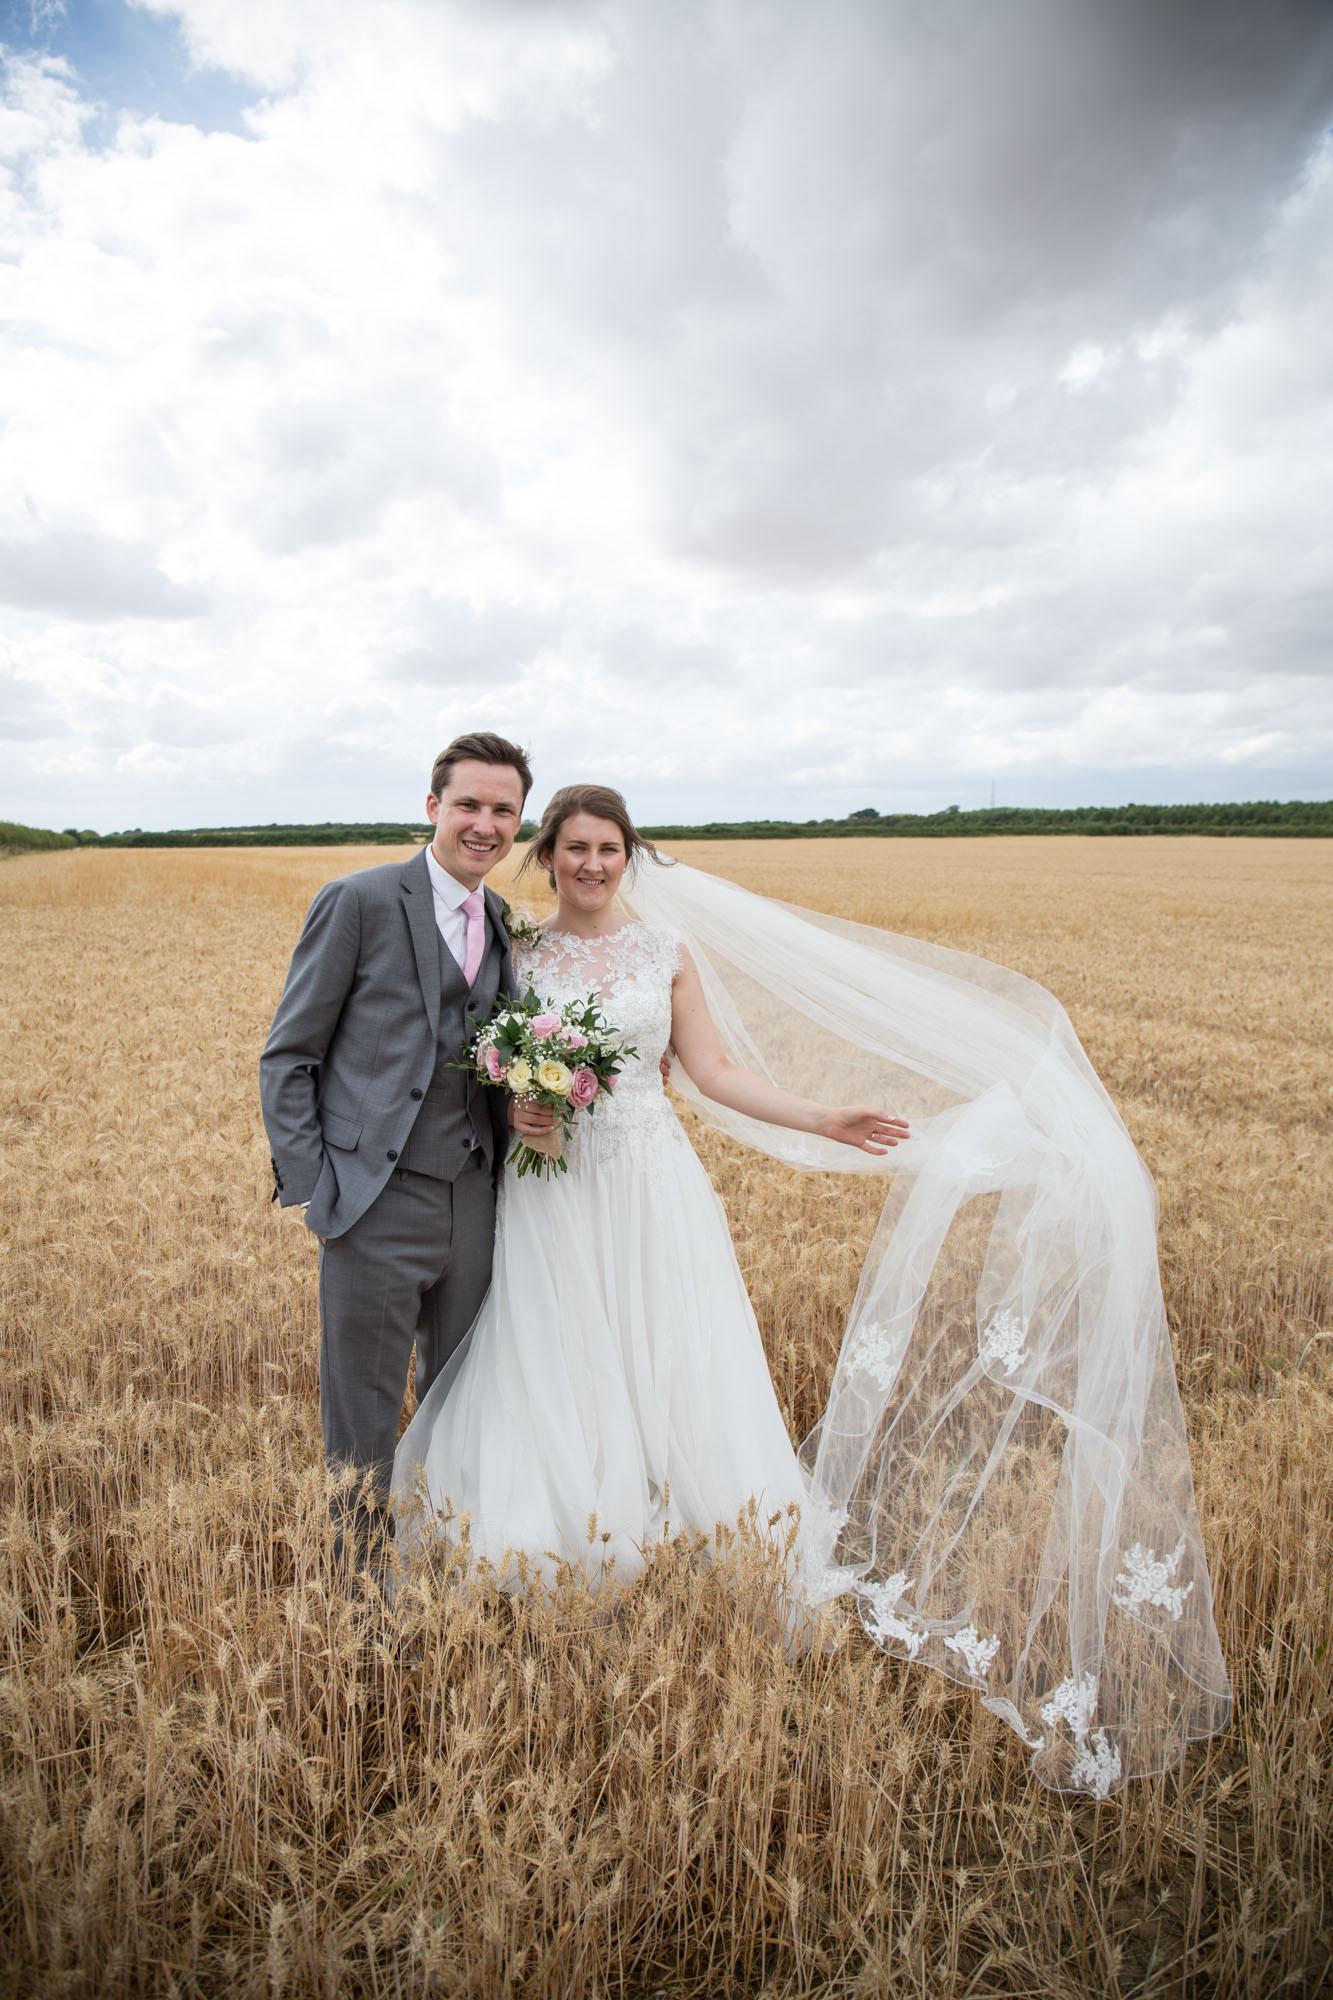 weddings-couples-love-photographer-oxford-london-jonathan-self-photography-68.jpg